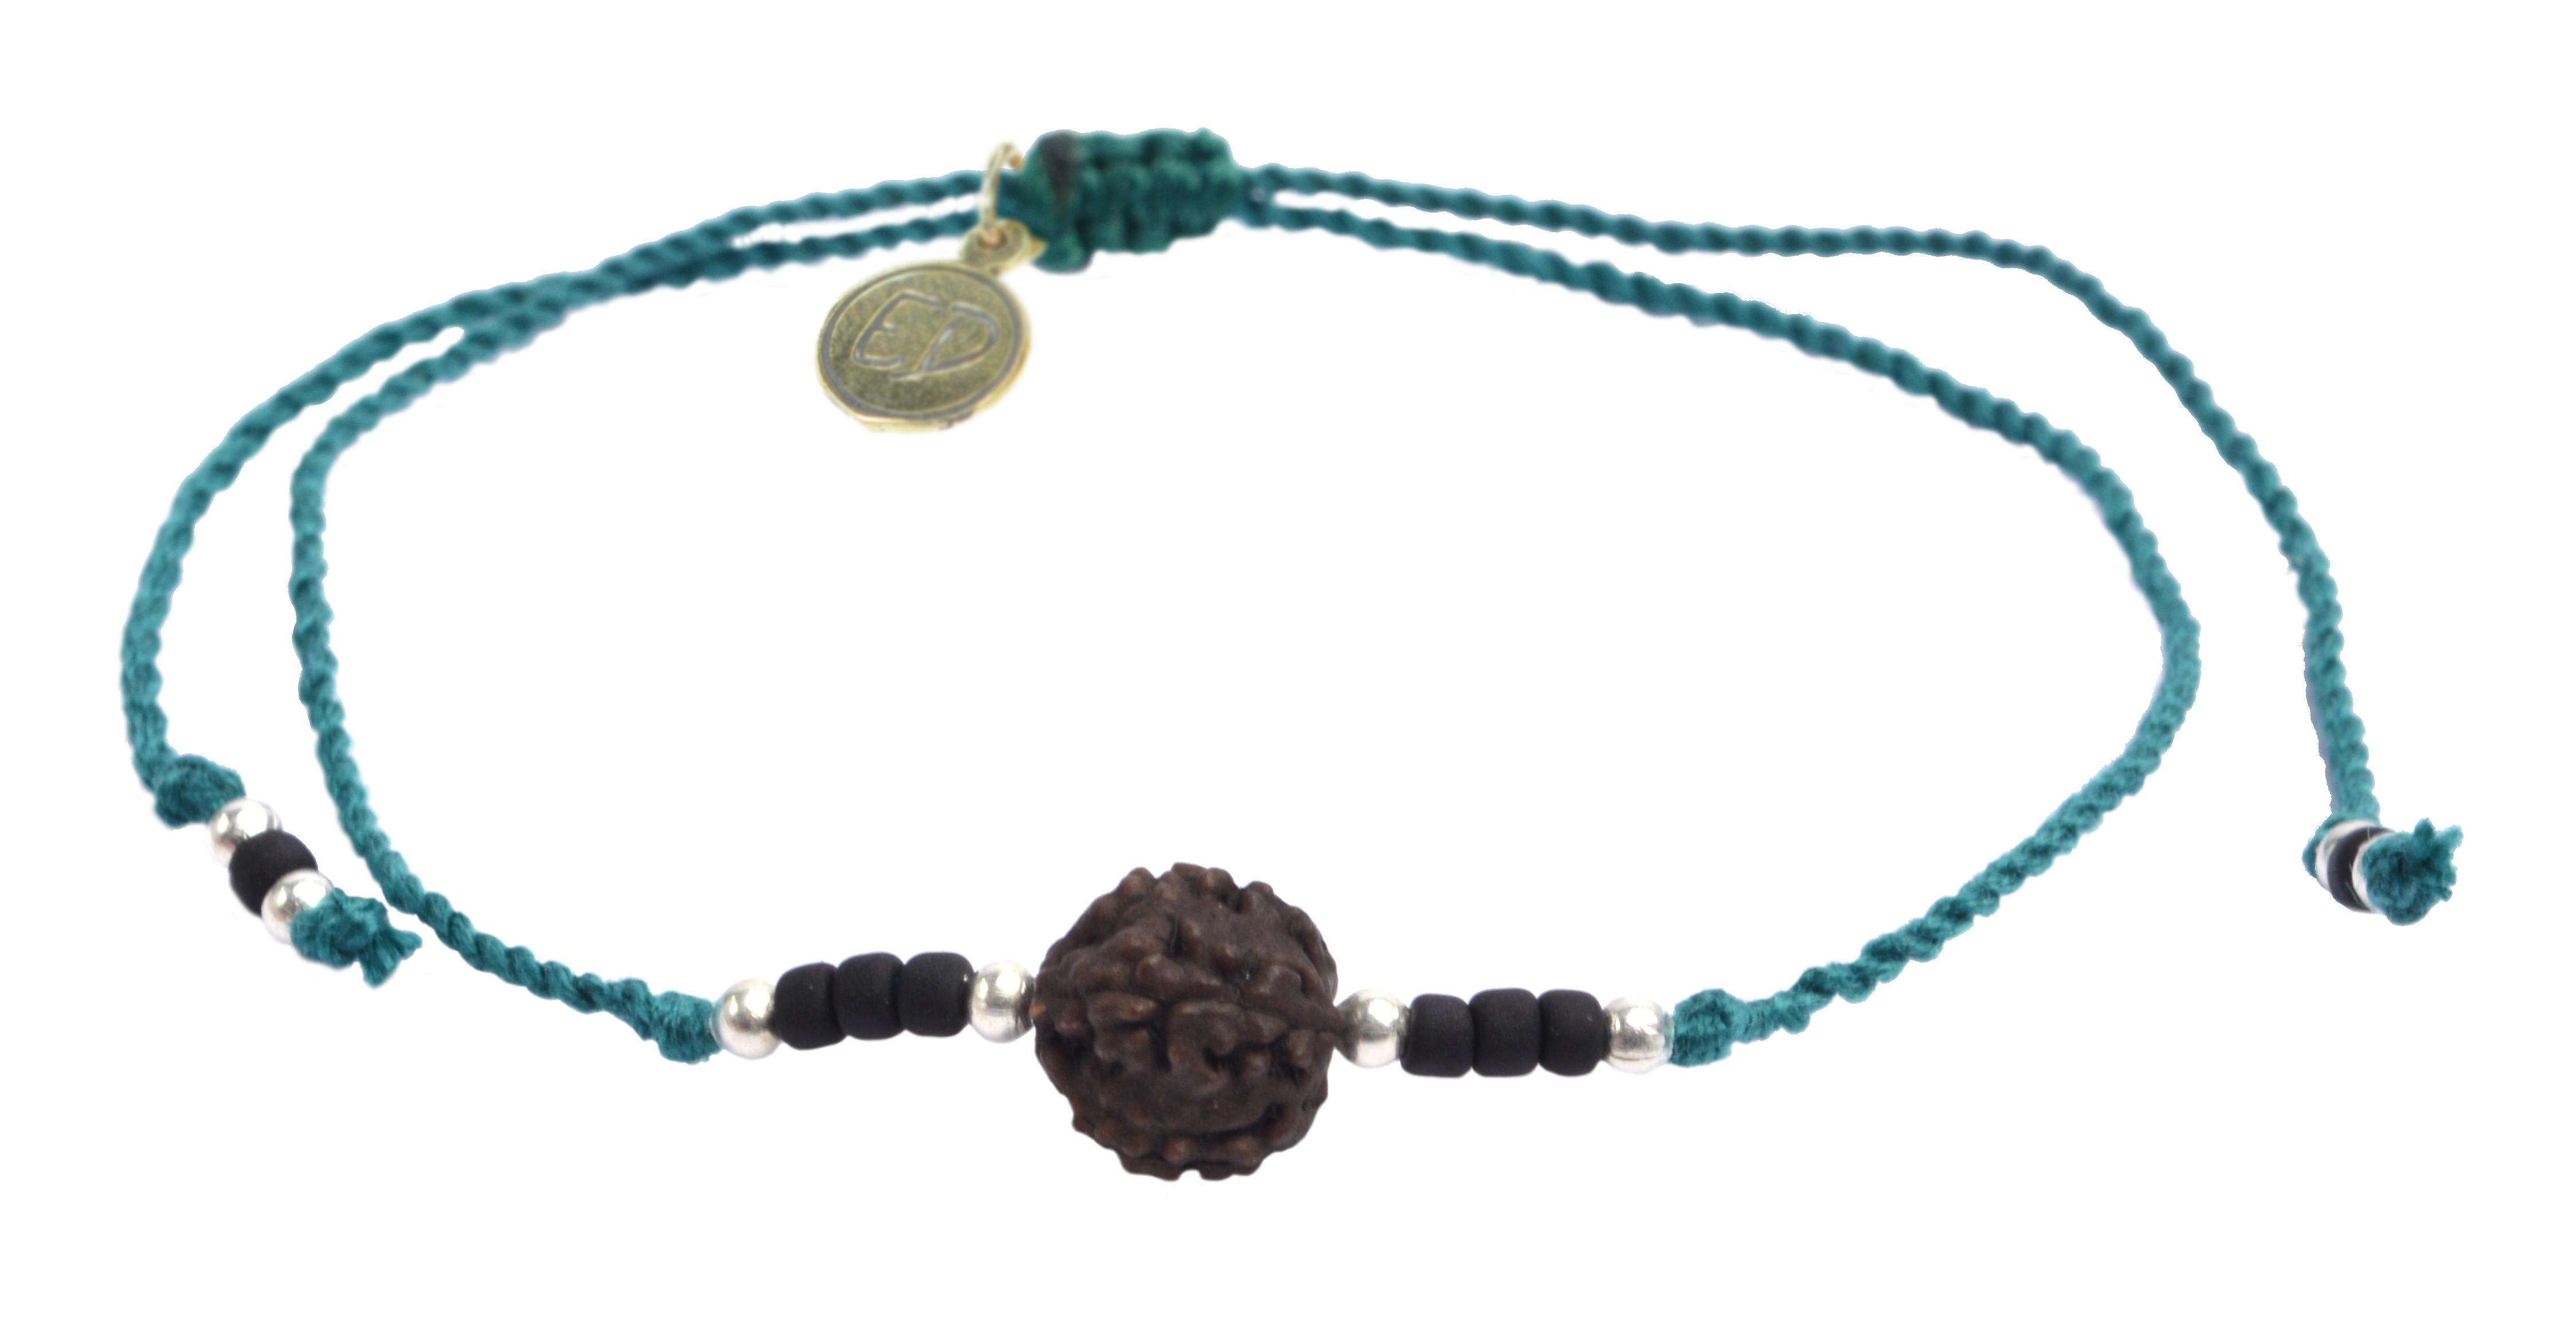 Šnúrkový náramok s tmavou korálkou Rudraksha - zelený